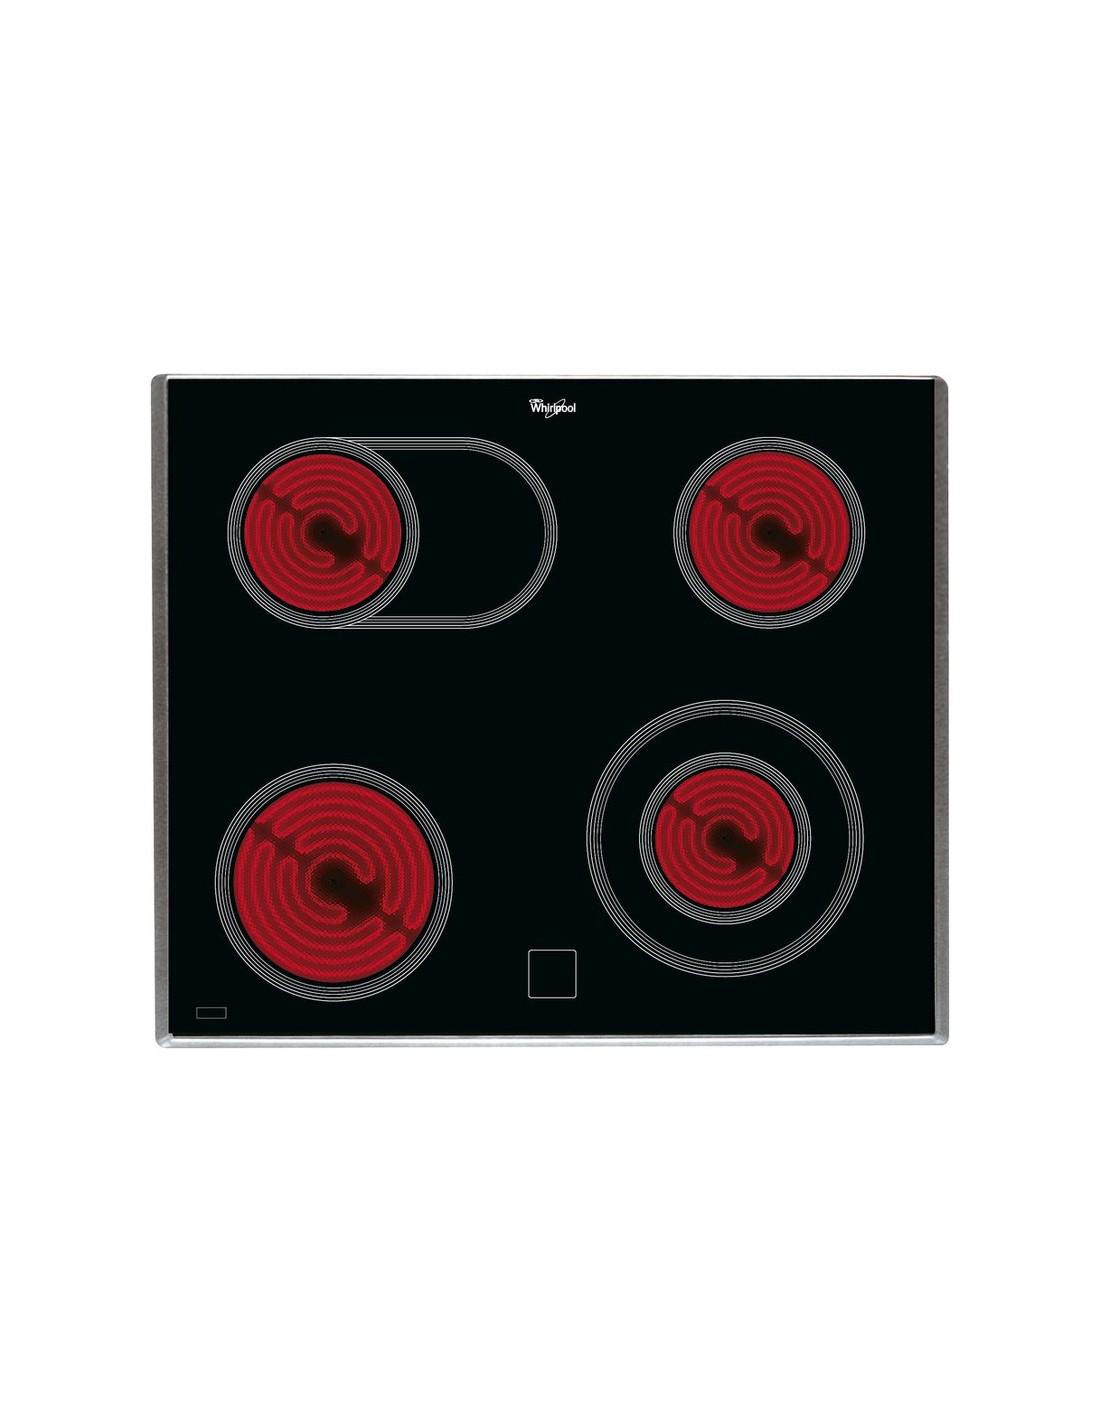 whirlpool einbauherd set akt 157 ix und akp 733 ix. Black Bedroom Furniture Sets. Home Design Ideas